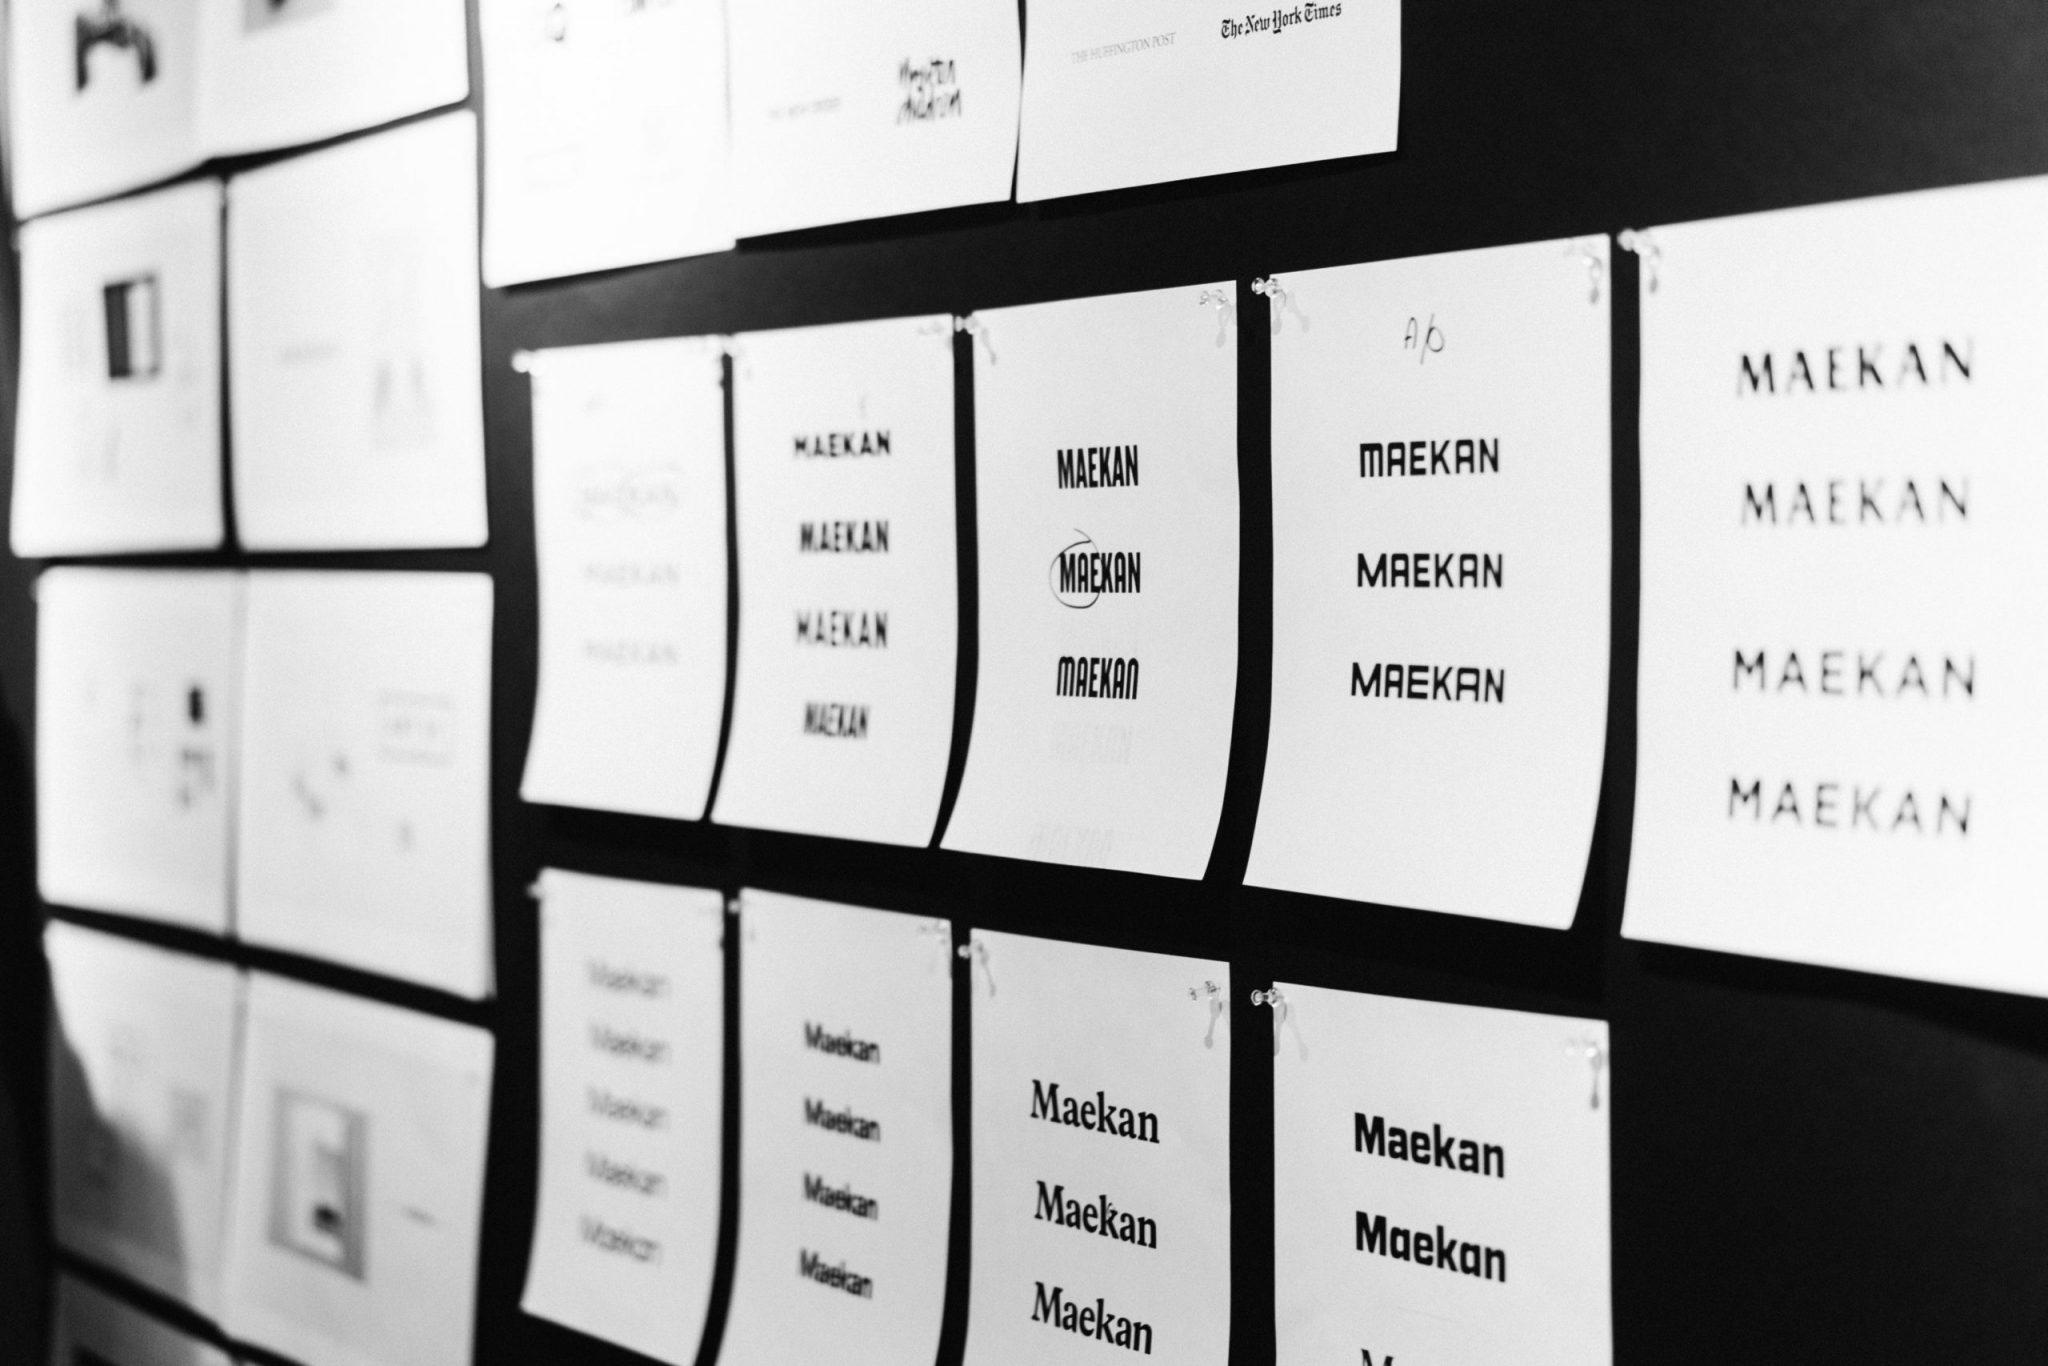 A physical mood board of initial MAEKAN wordmark options